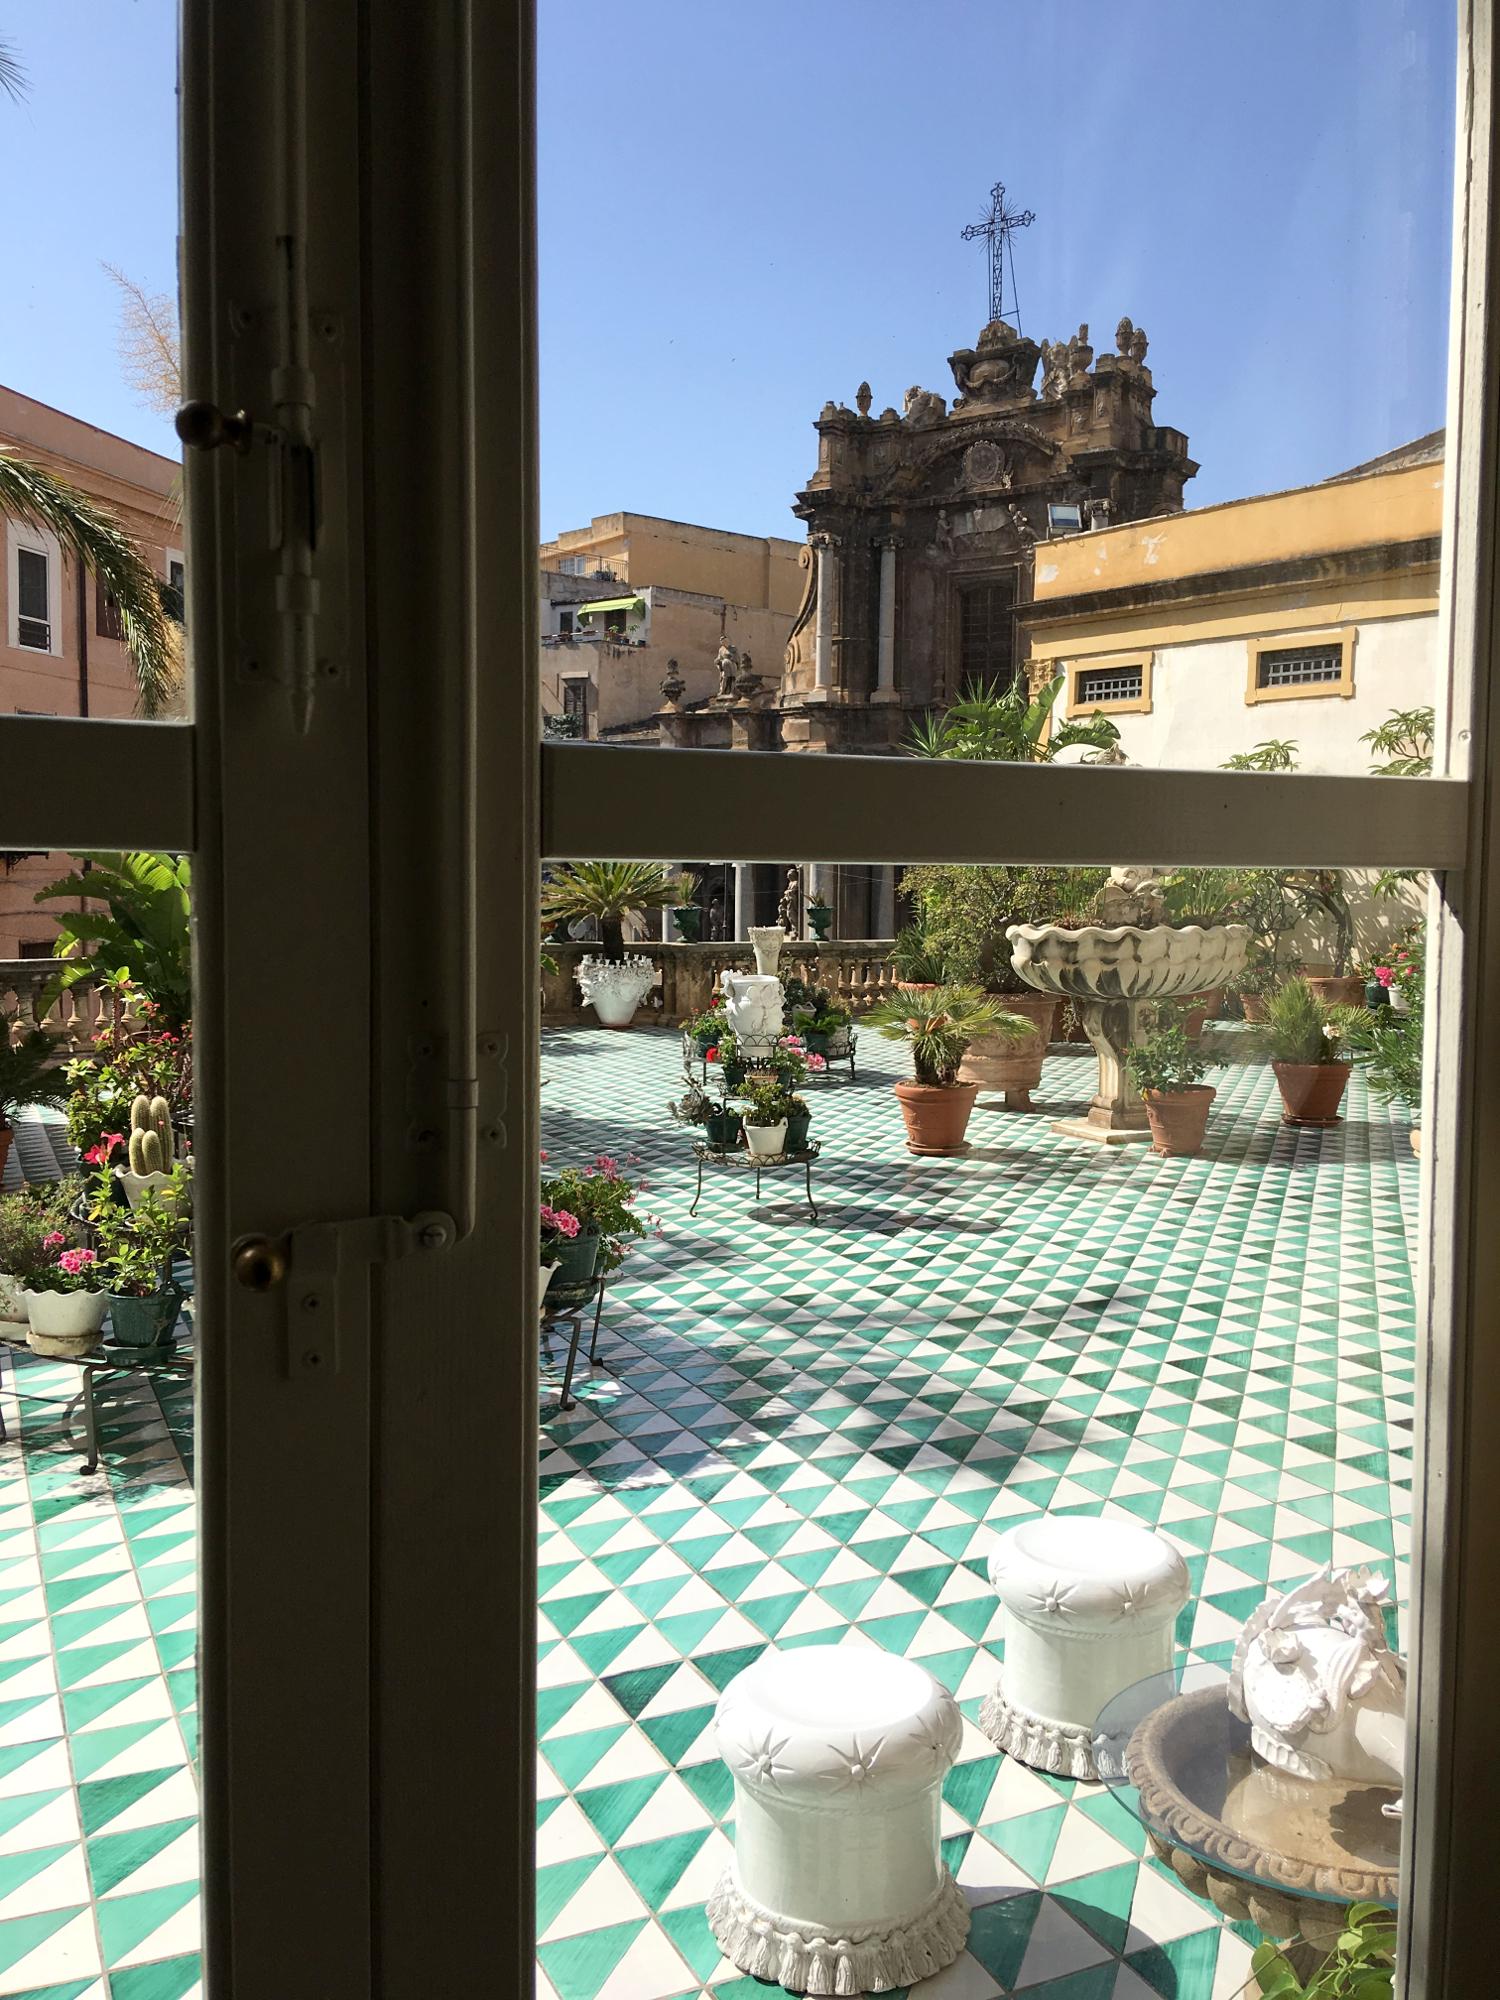 rocaille-blog-palermo-palazzo-valguarnera-gangi-gattopardo-2